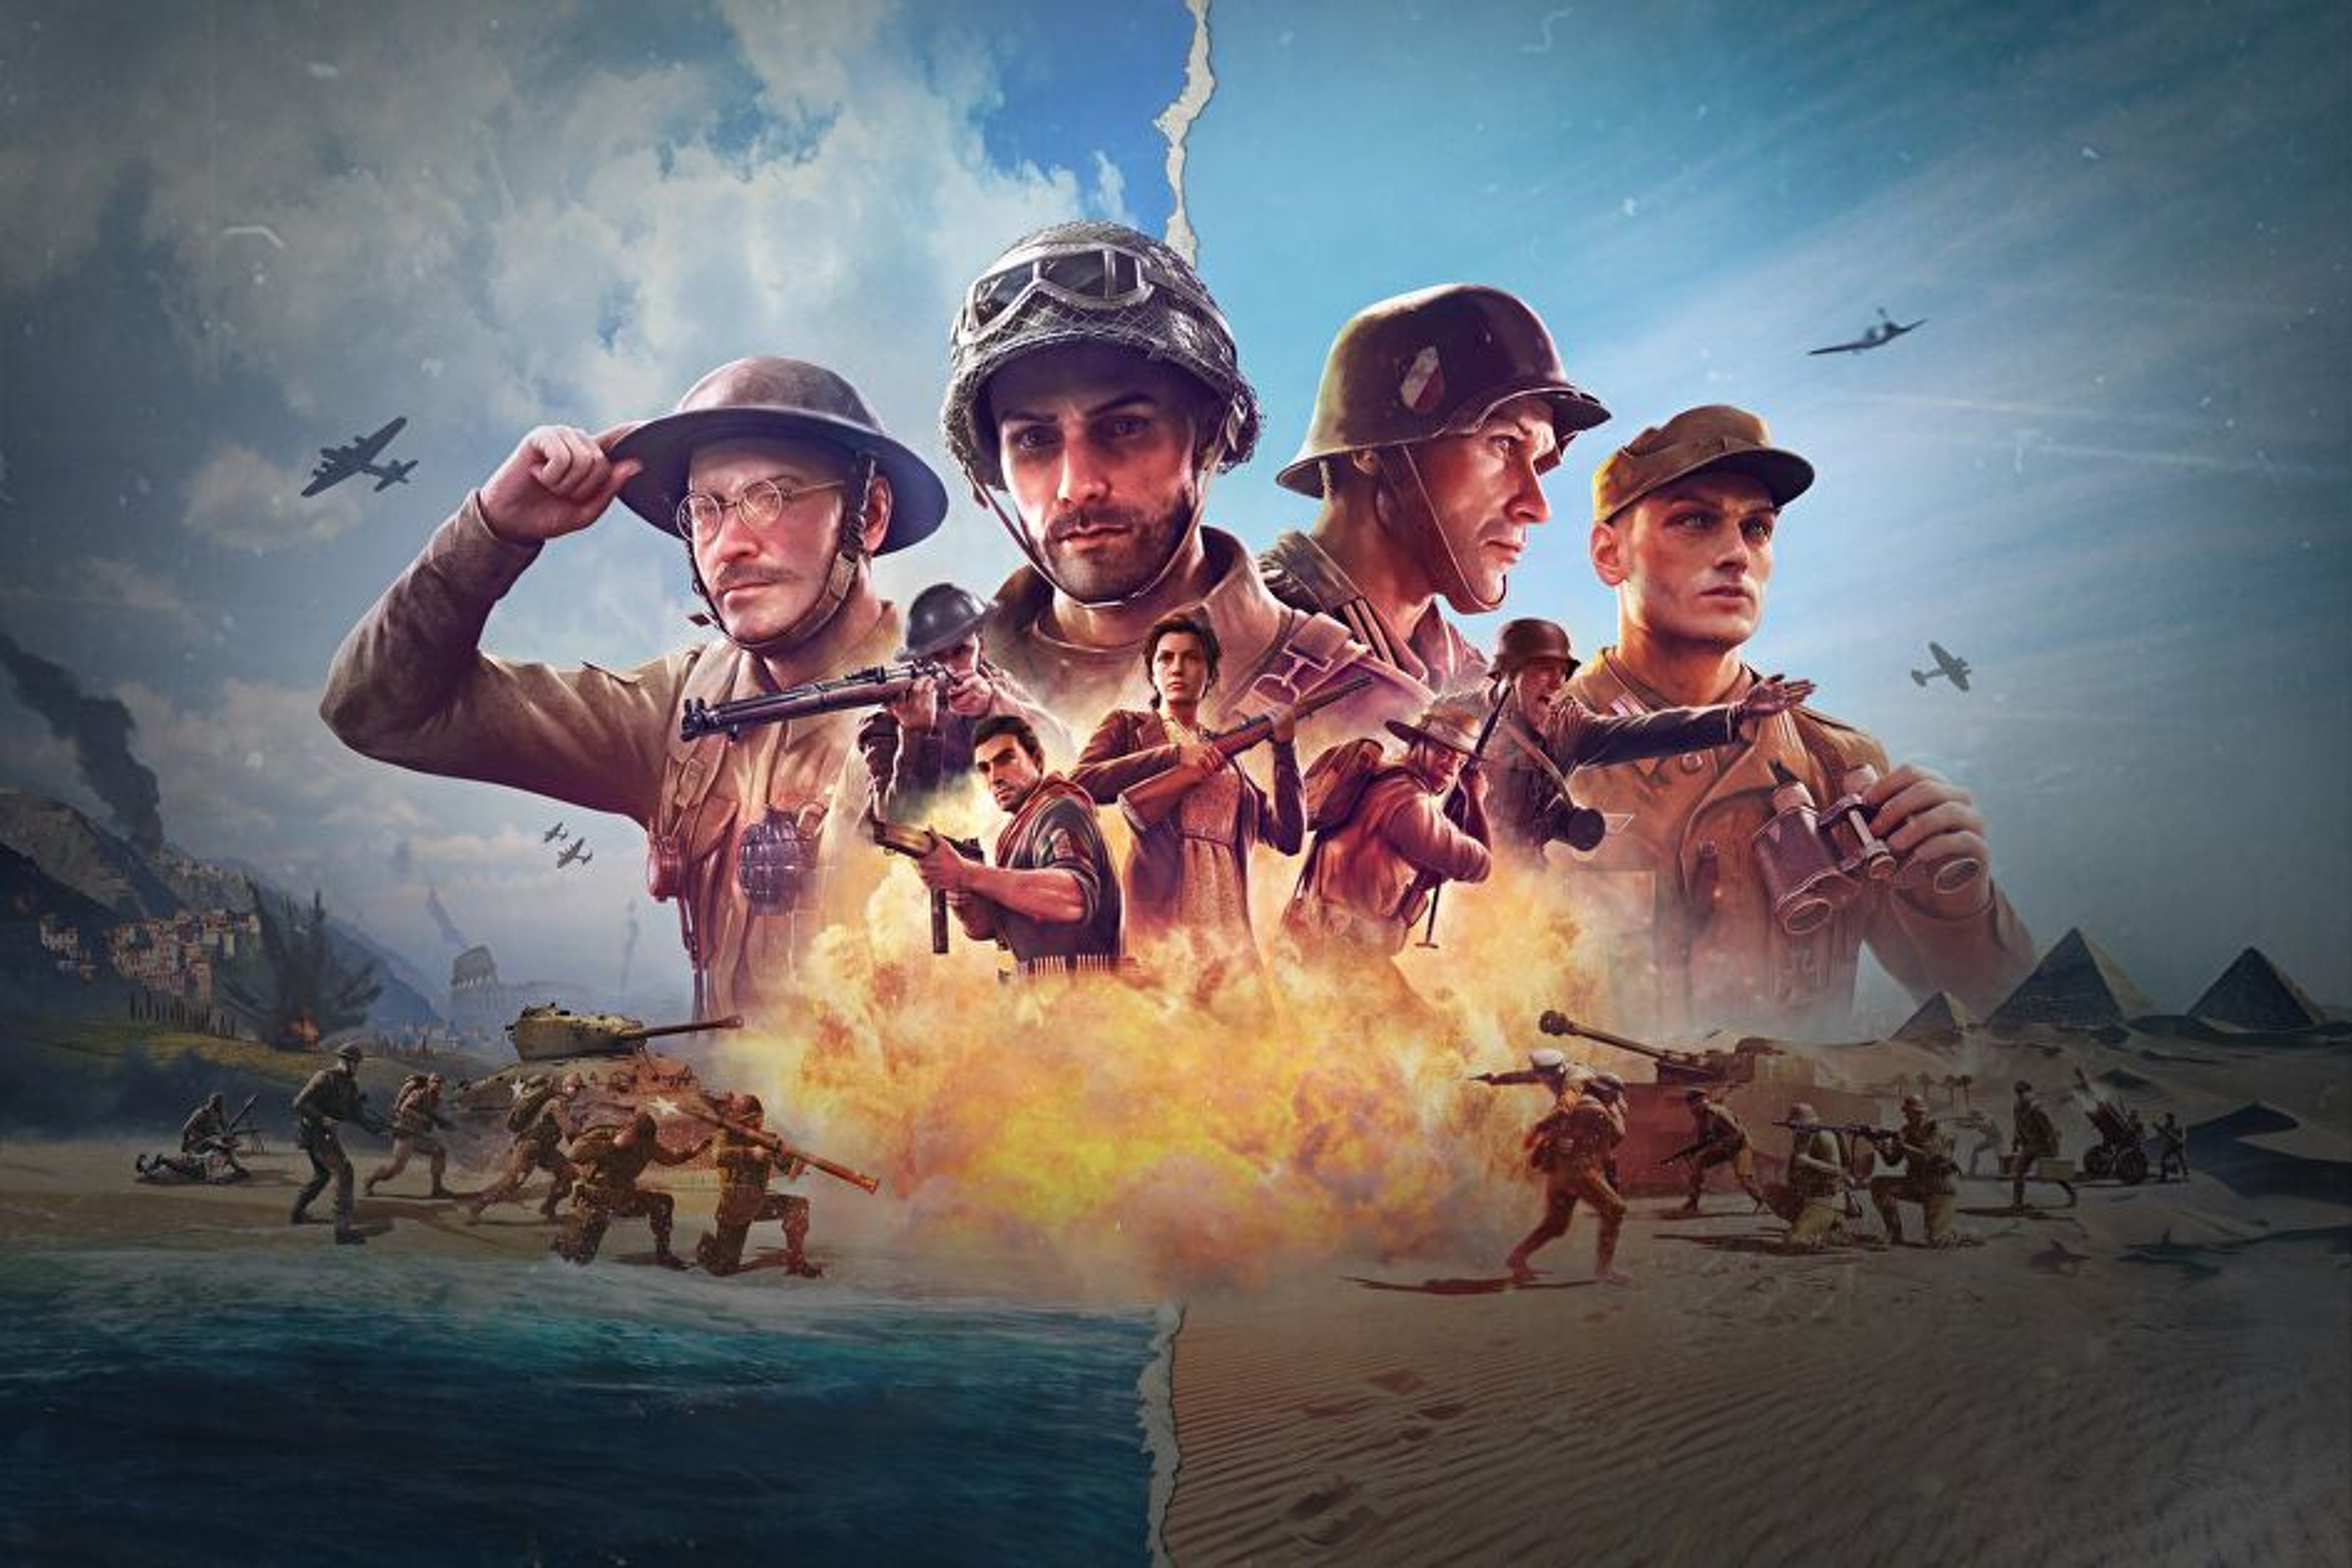 Video Company of Heroes 3 memperdalam proses pengembangan dan menunjukkan bidikan baru